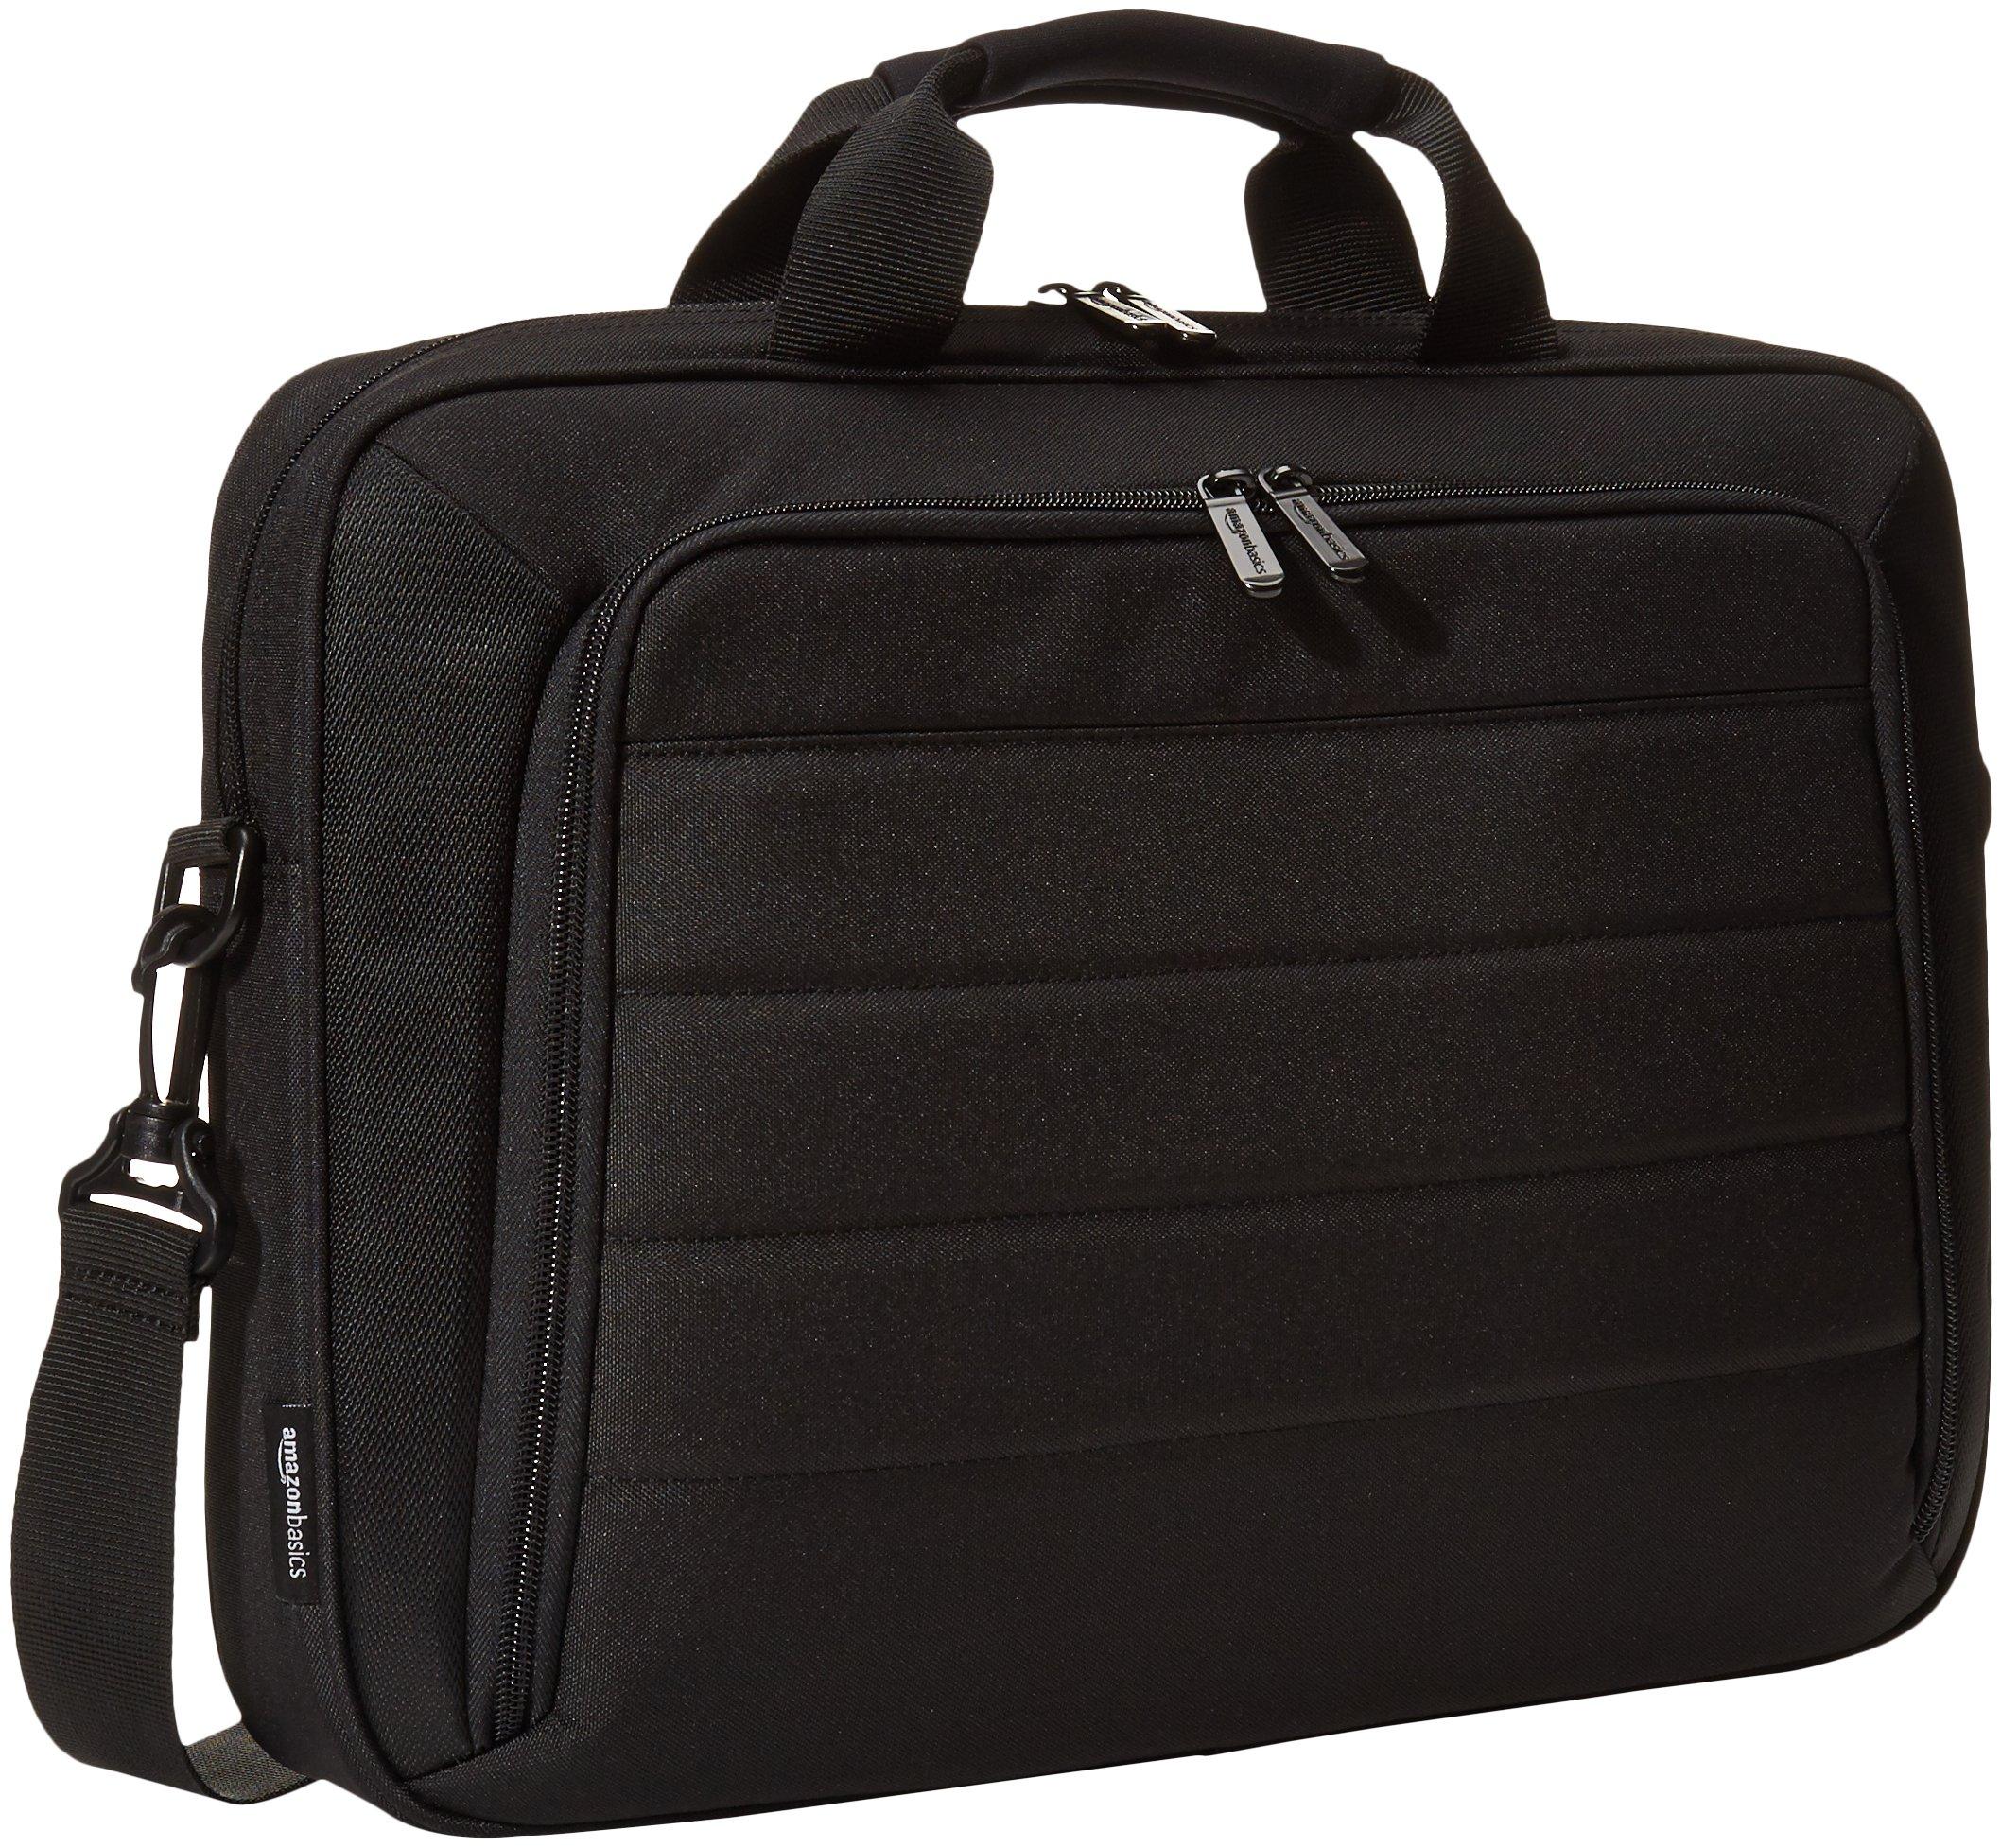 AmazonBasics 15.6 Inch Laptop and Tablet Case Shoulder Bag, Black by AmazonBasics